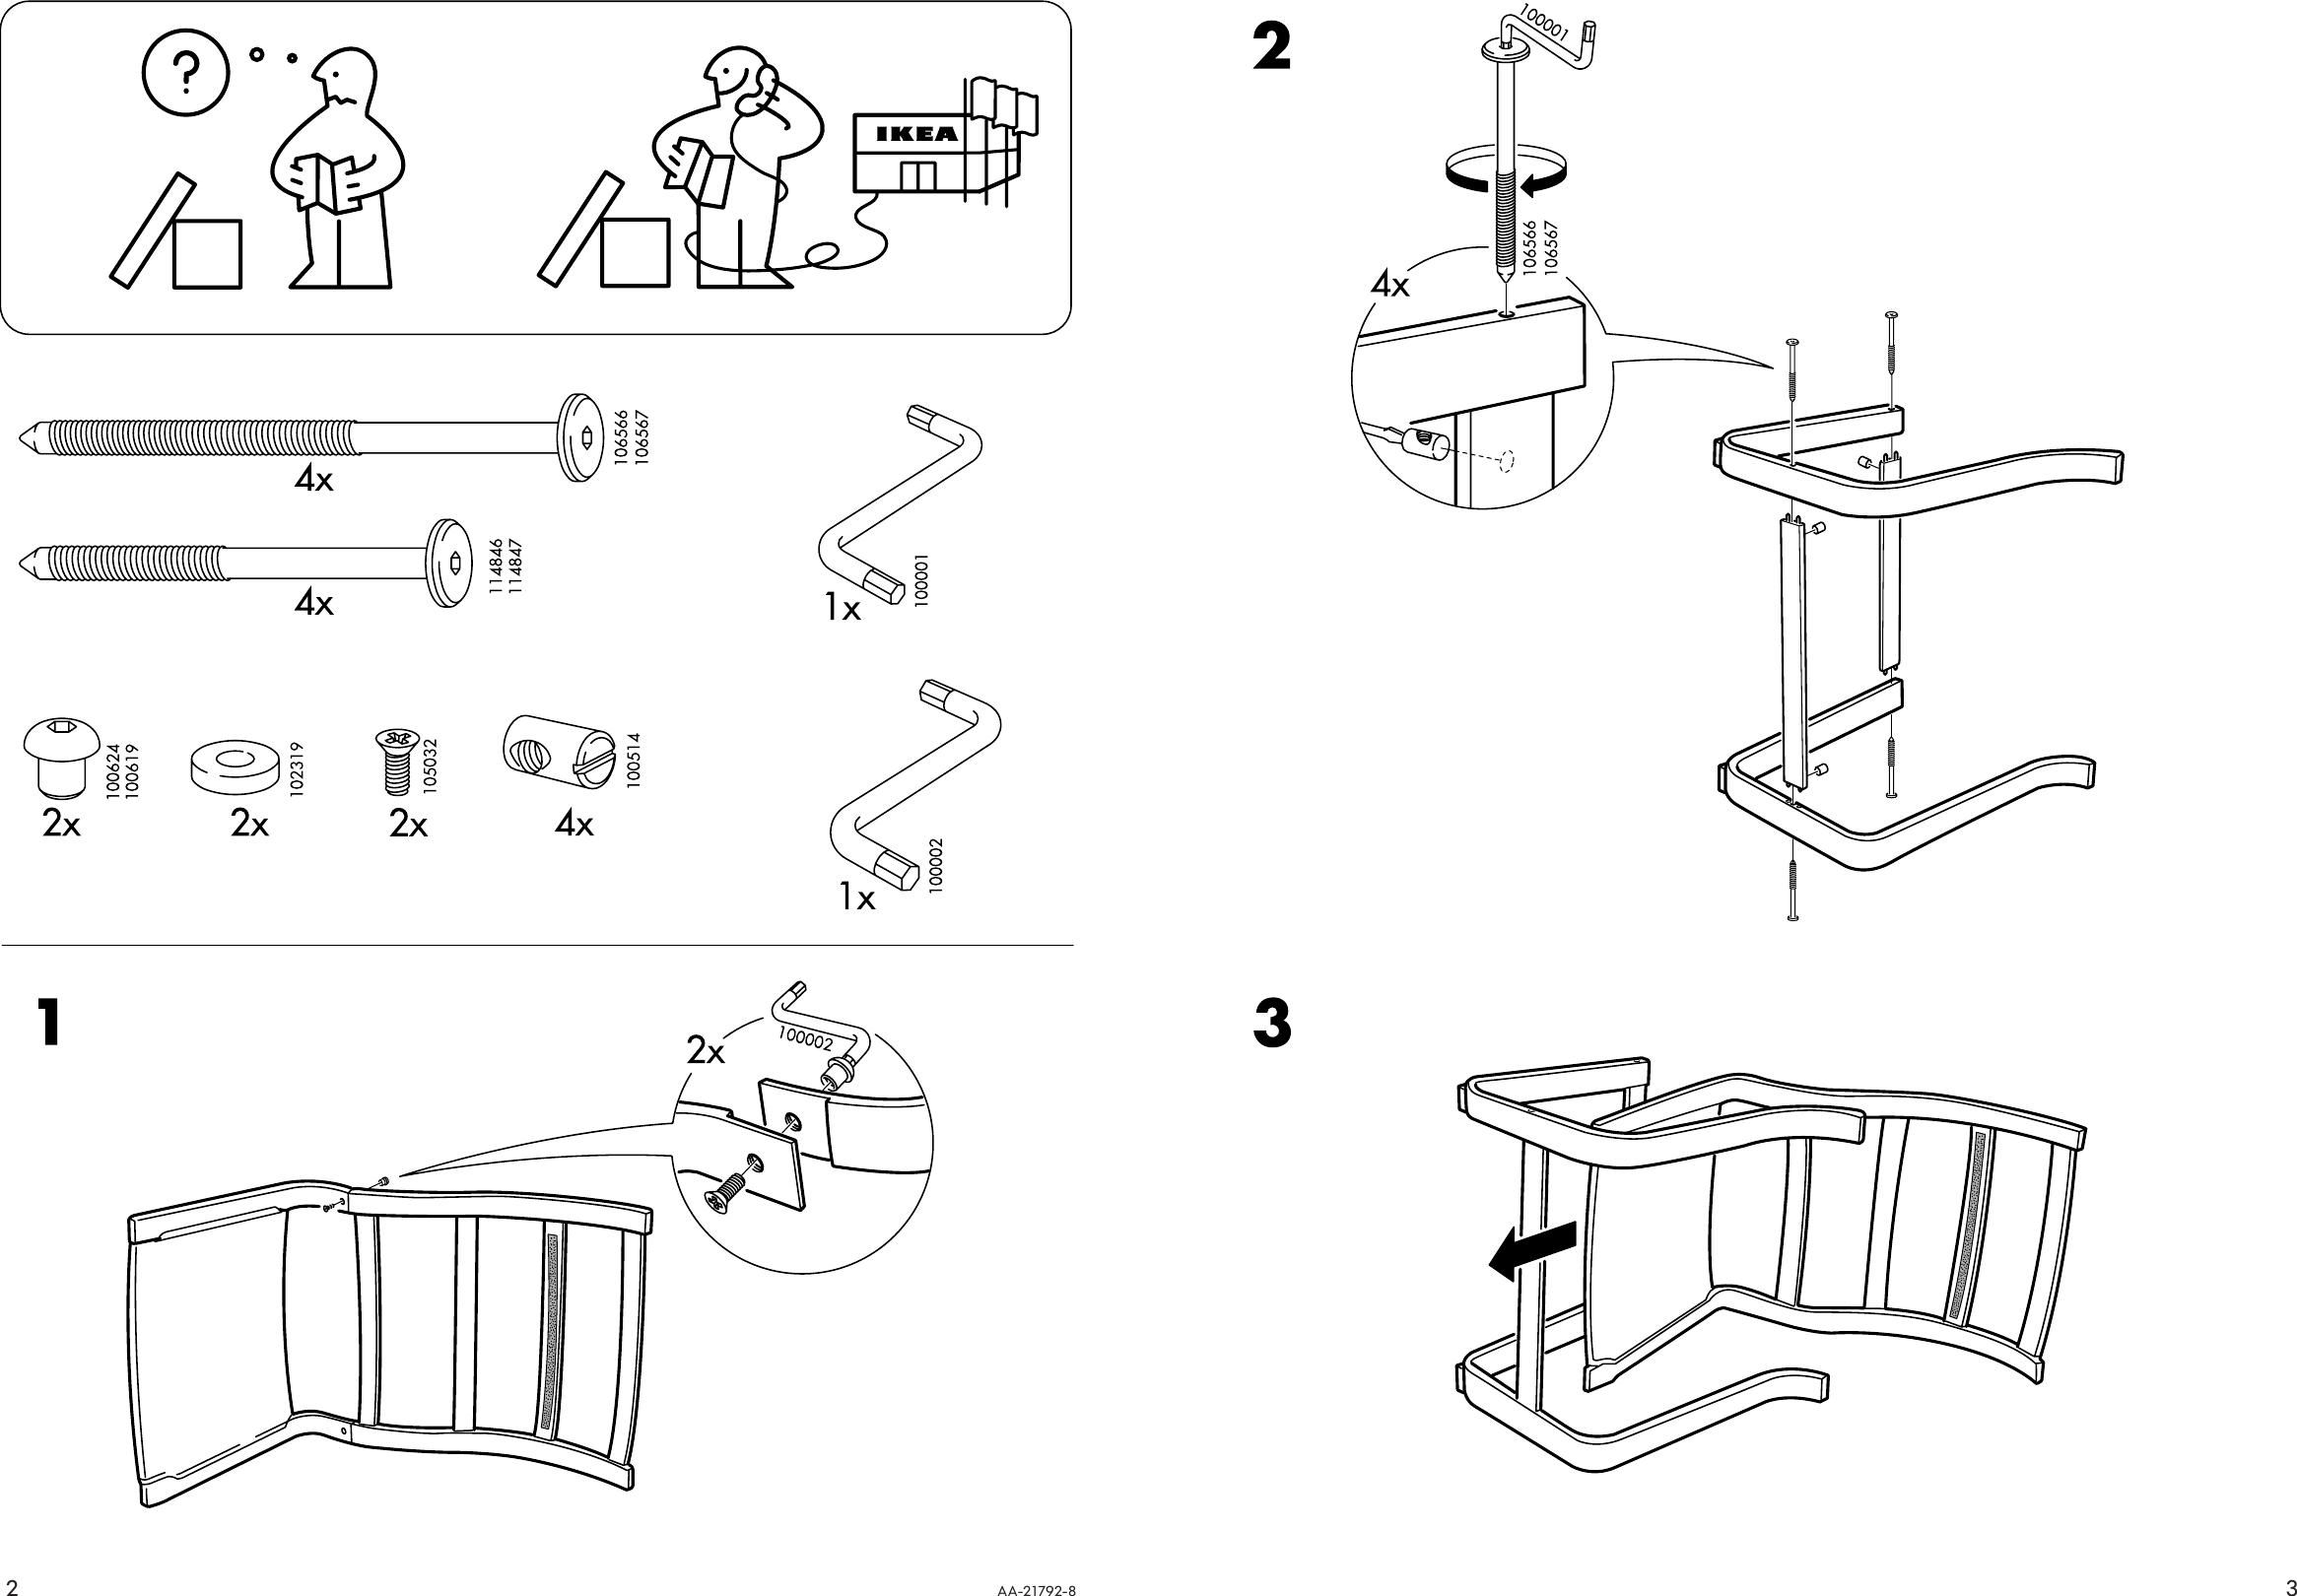 summera ikea instructions images form 1040 instructions. Black Bedroom Furniture Sets. Home Design Ideas